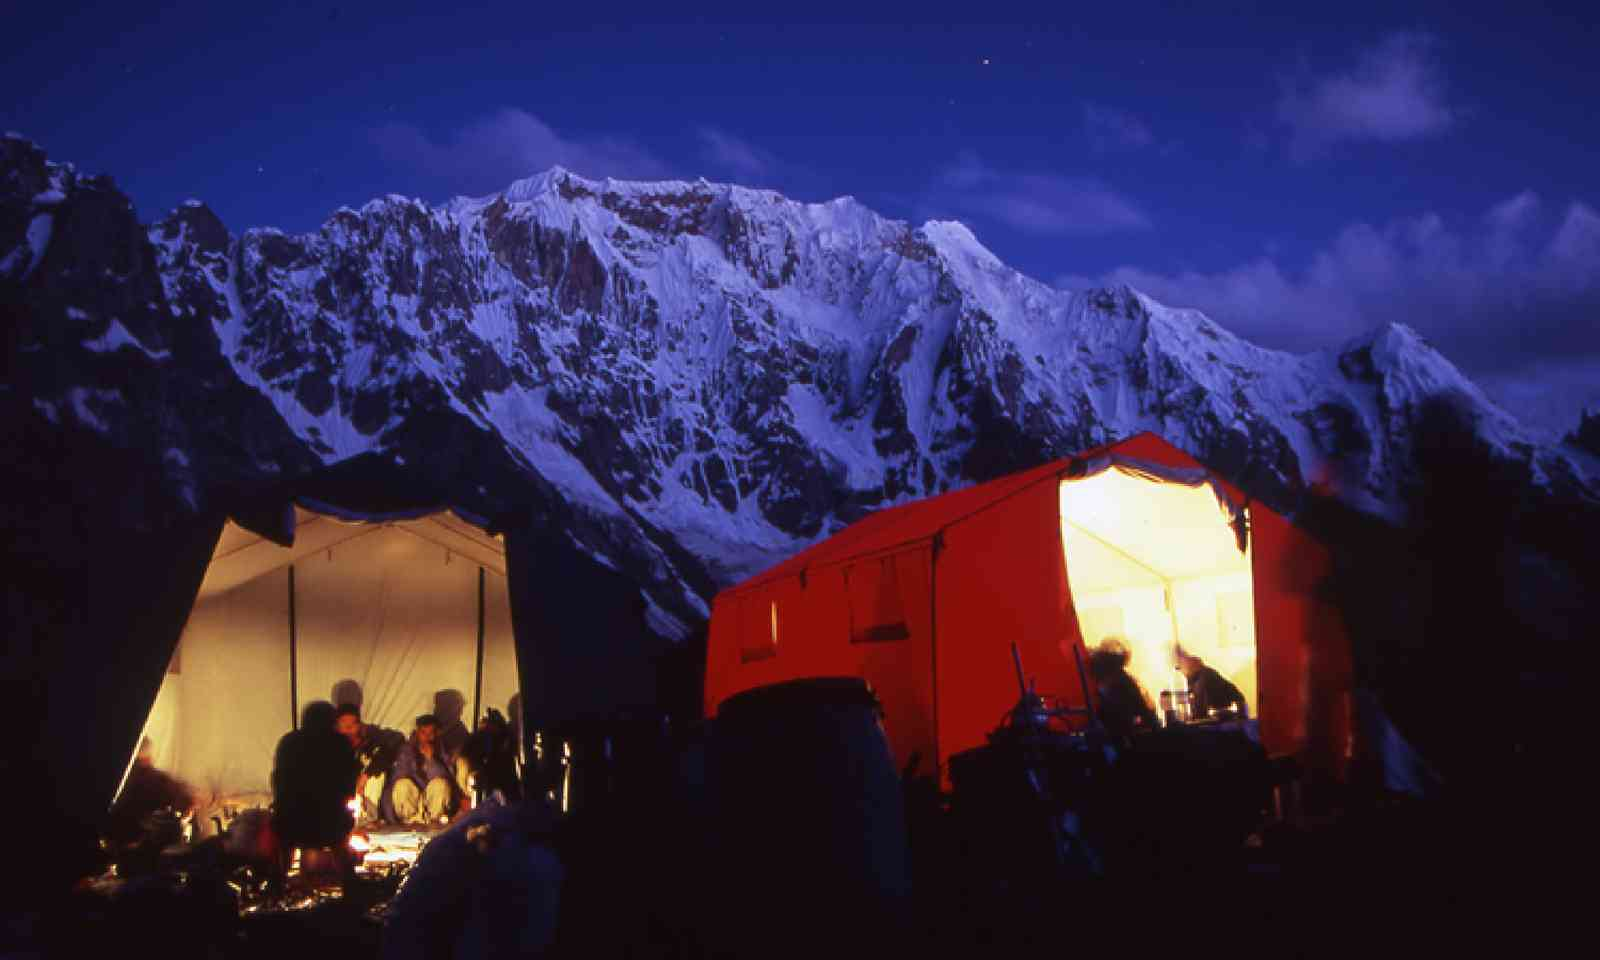 Camp at Gore II by night, (Photo: J Turner / Mountain Kingdoms)